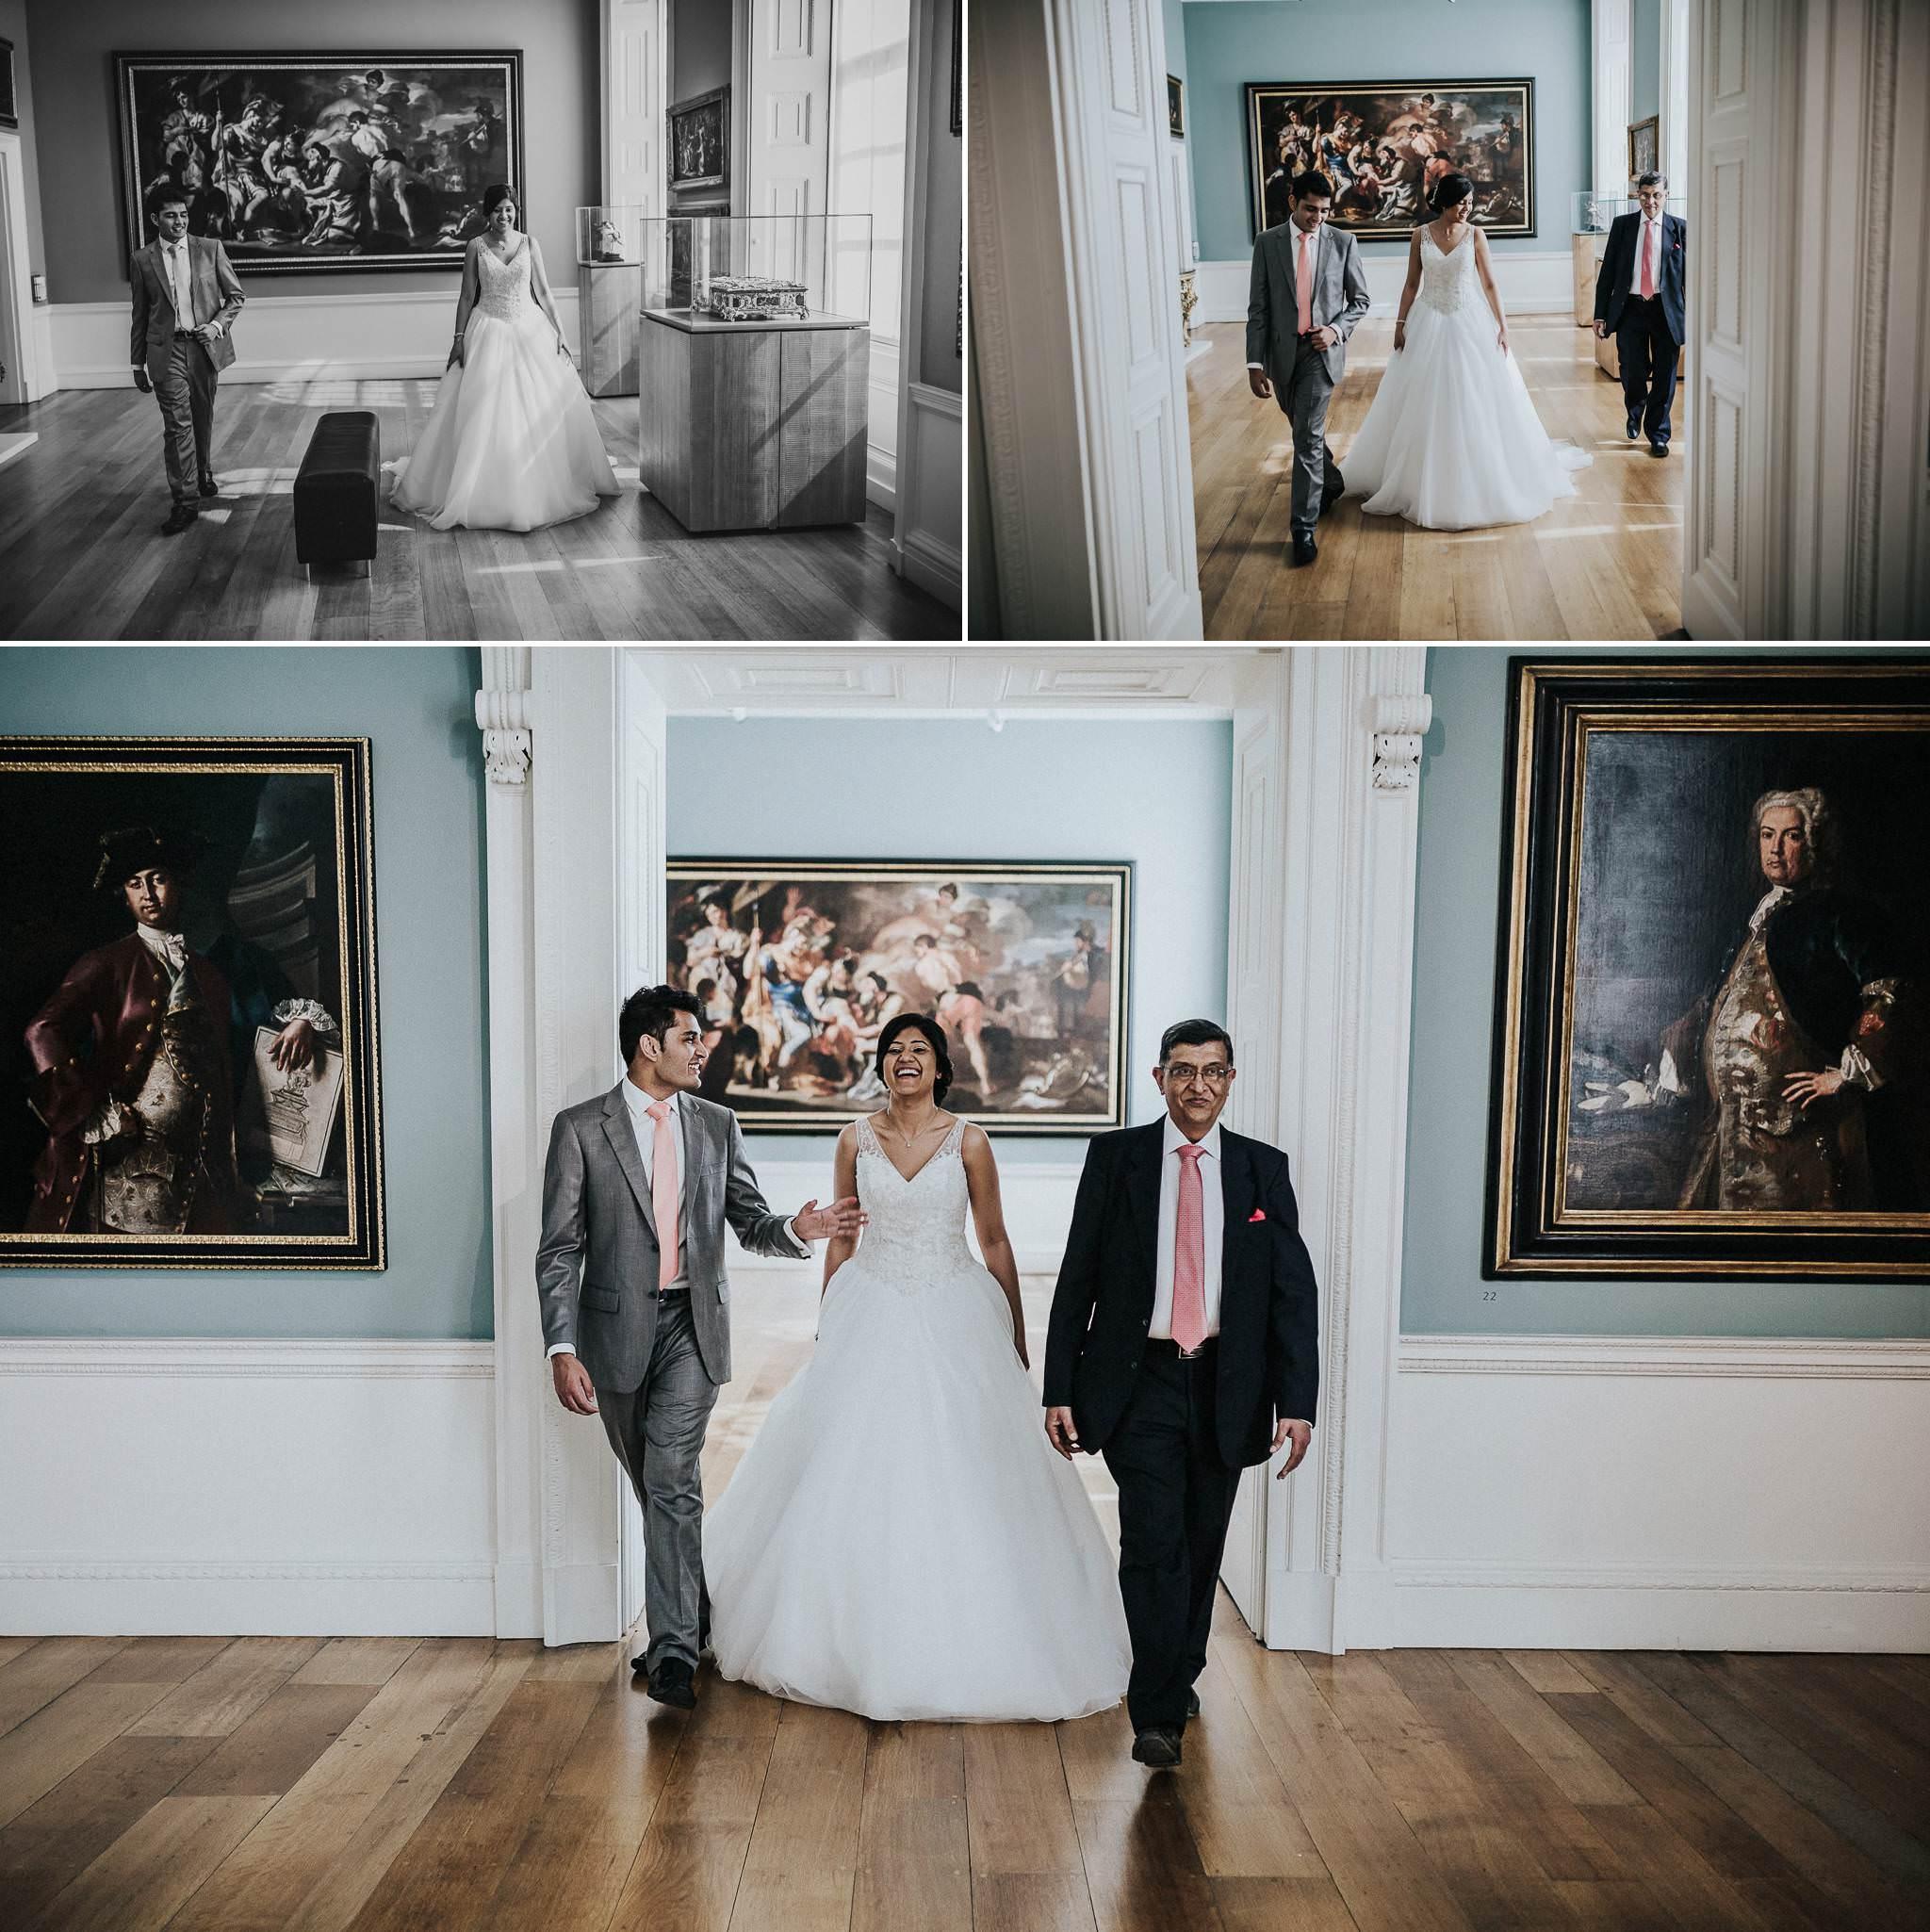 compton-verney-wedding-photos 12.jpg